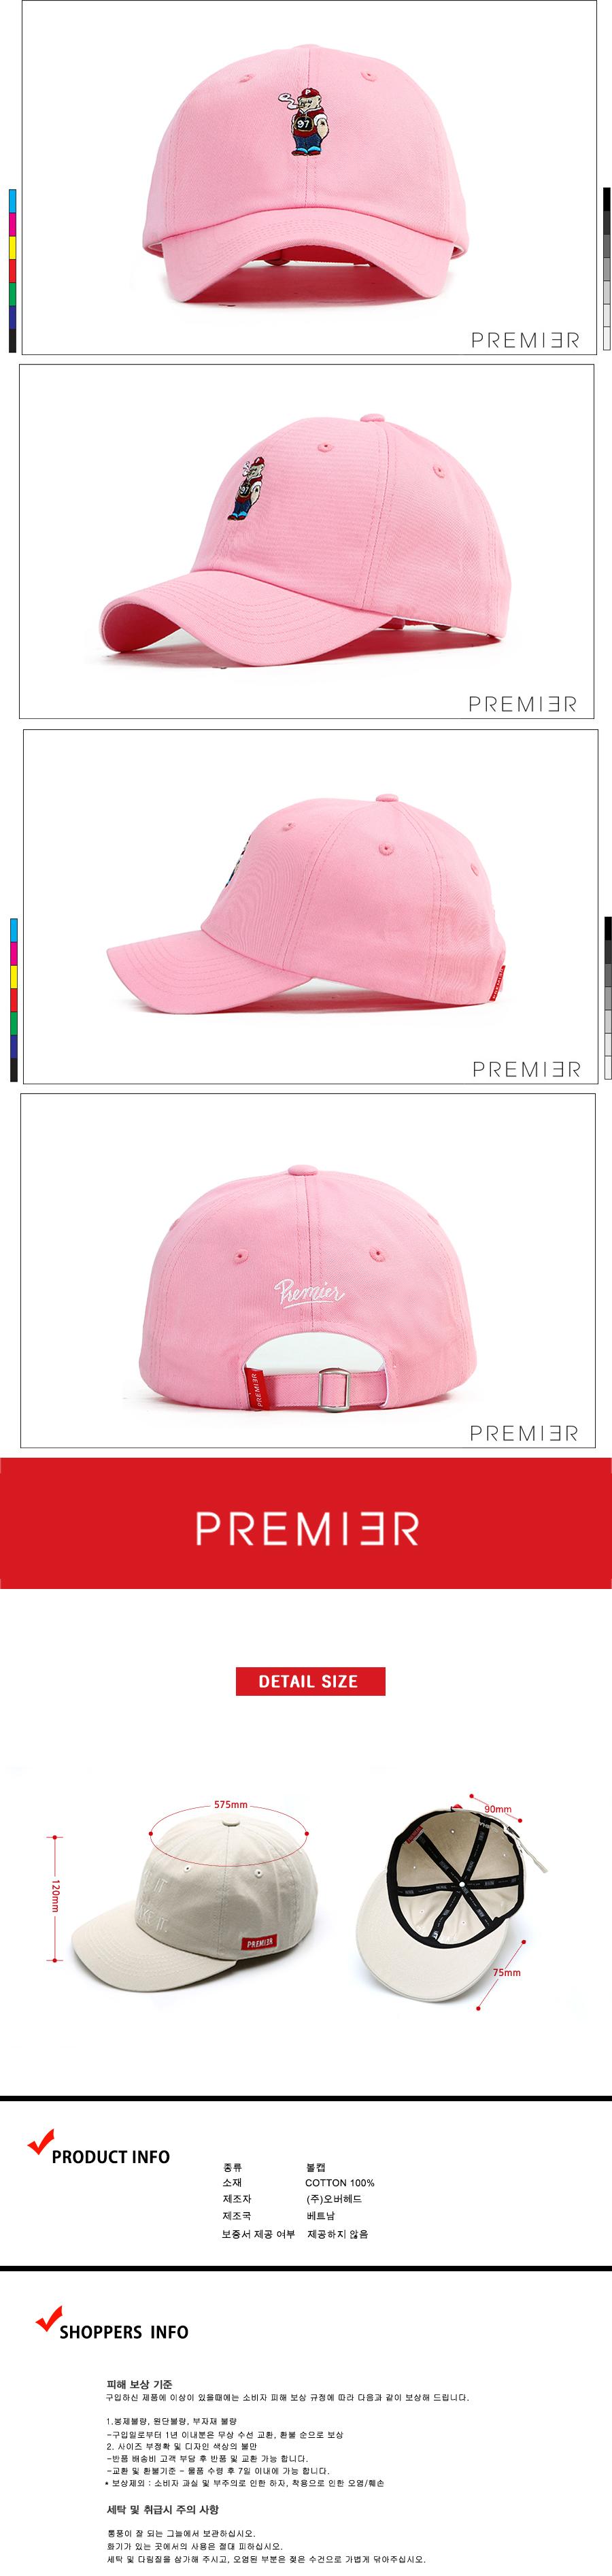 [ PREMIER ] [Premier] Ball Cap 97 Bear Pink (P935)